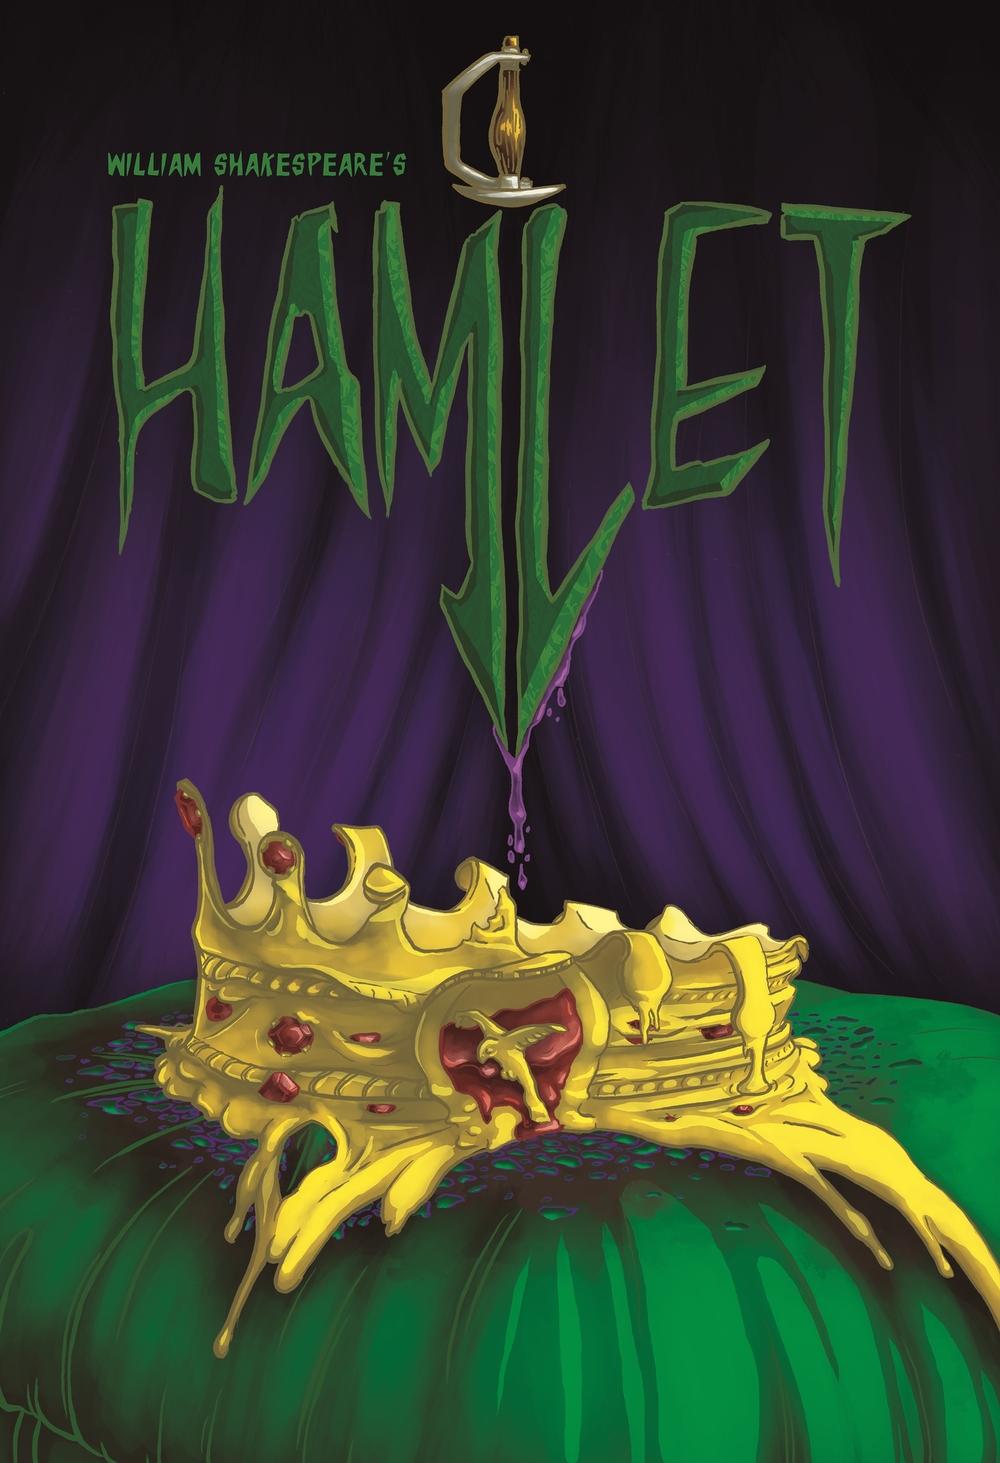 Fallen Kingdom of Hamlet